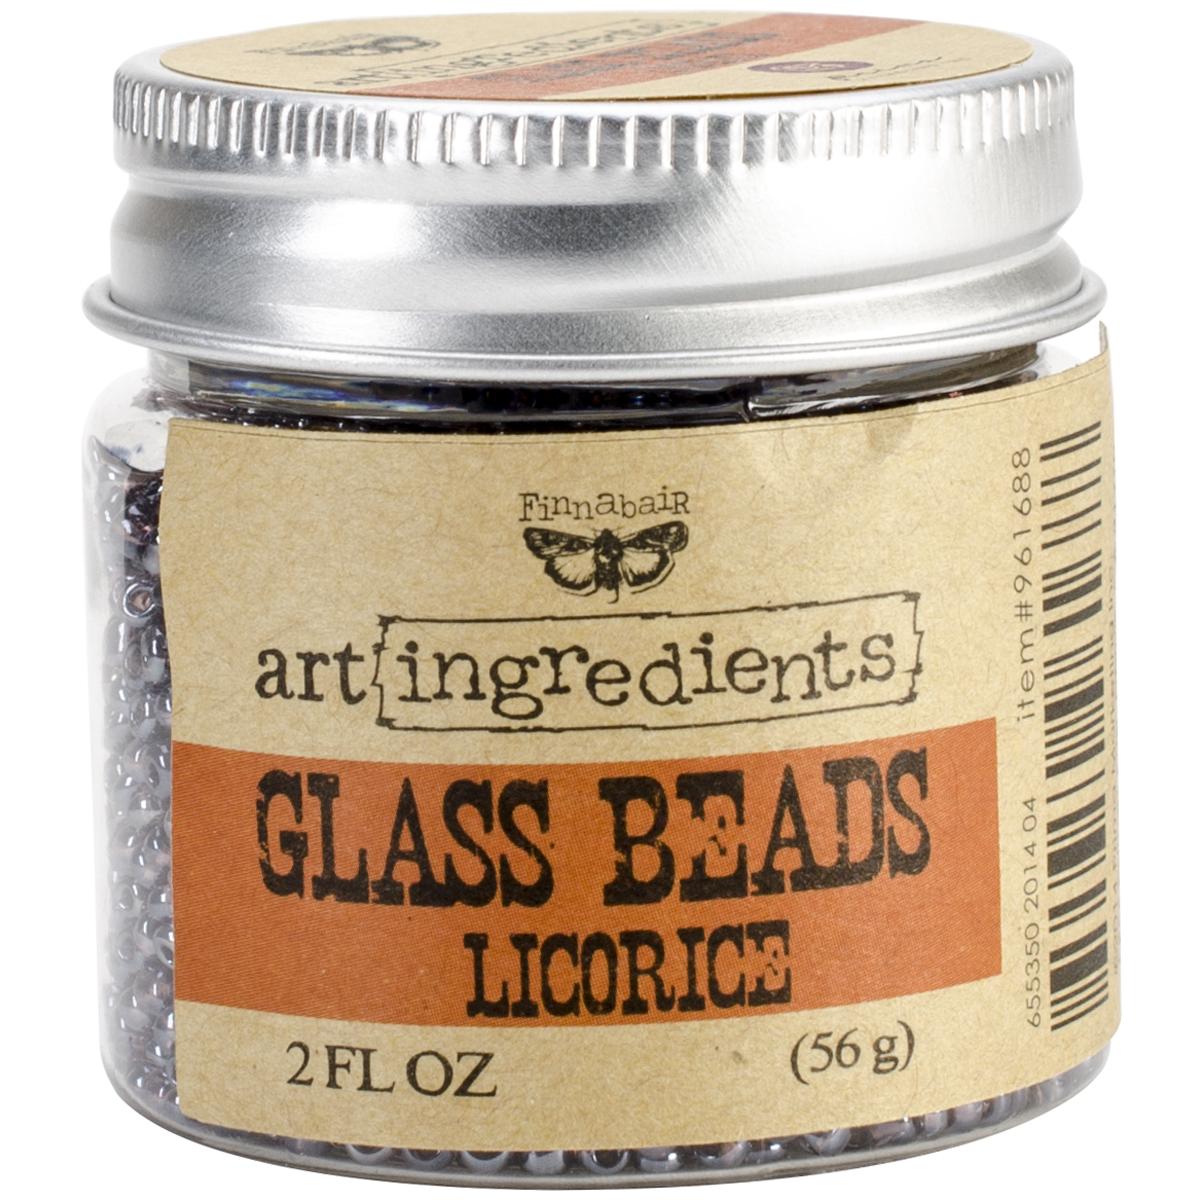 Finnabair Art Ingredients Glass Beads 2oz-Licorice